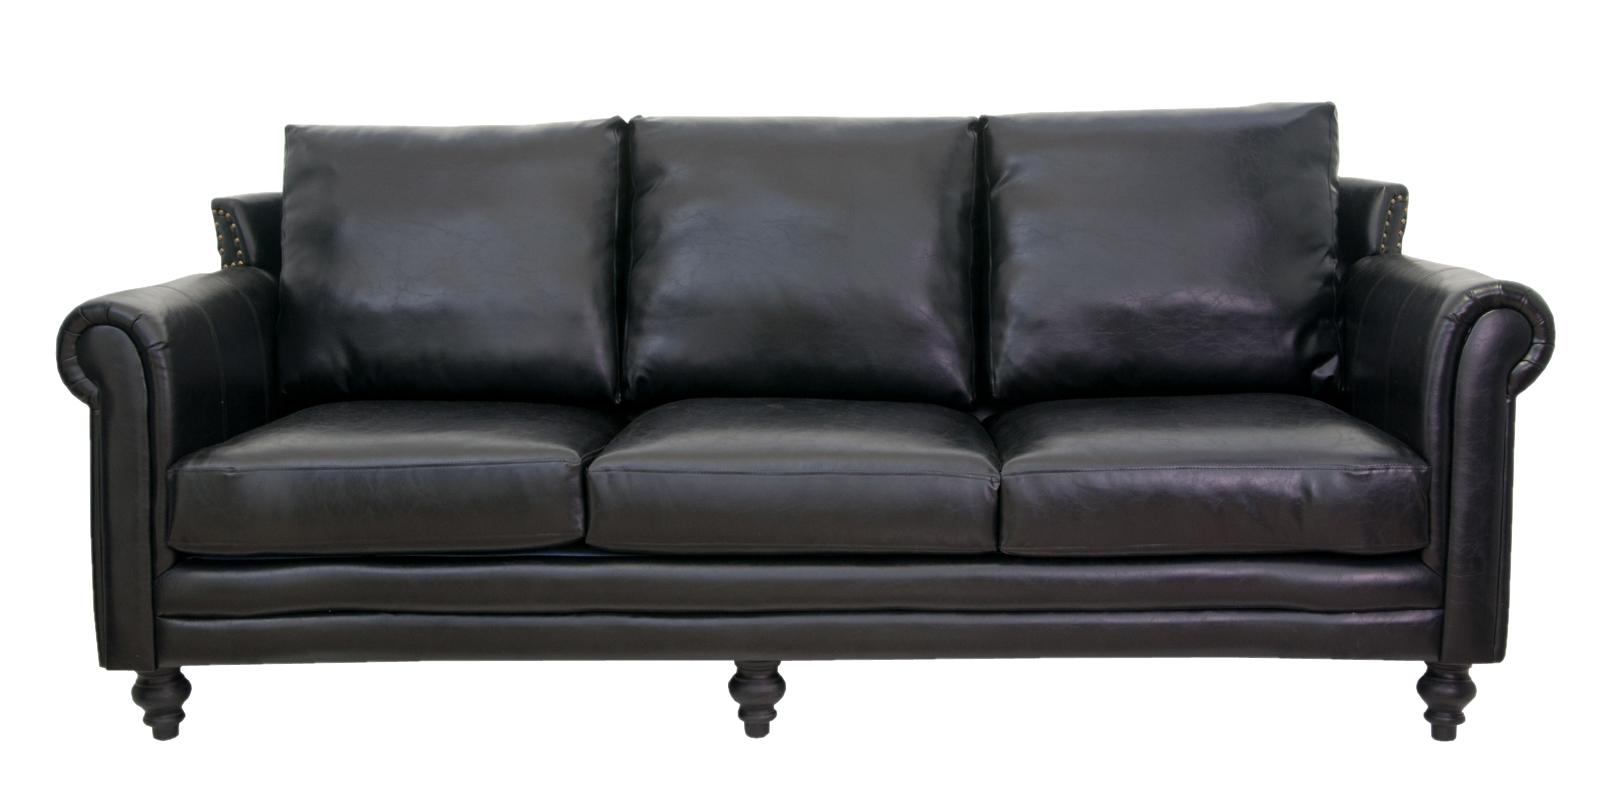 sf-2848-1